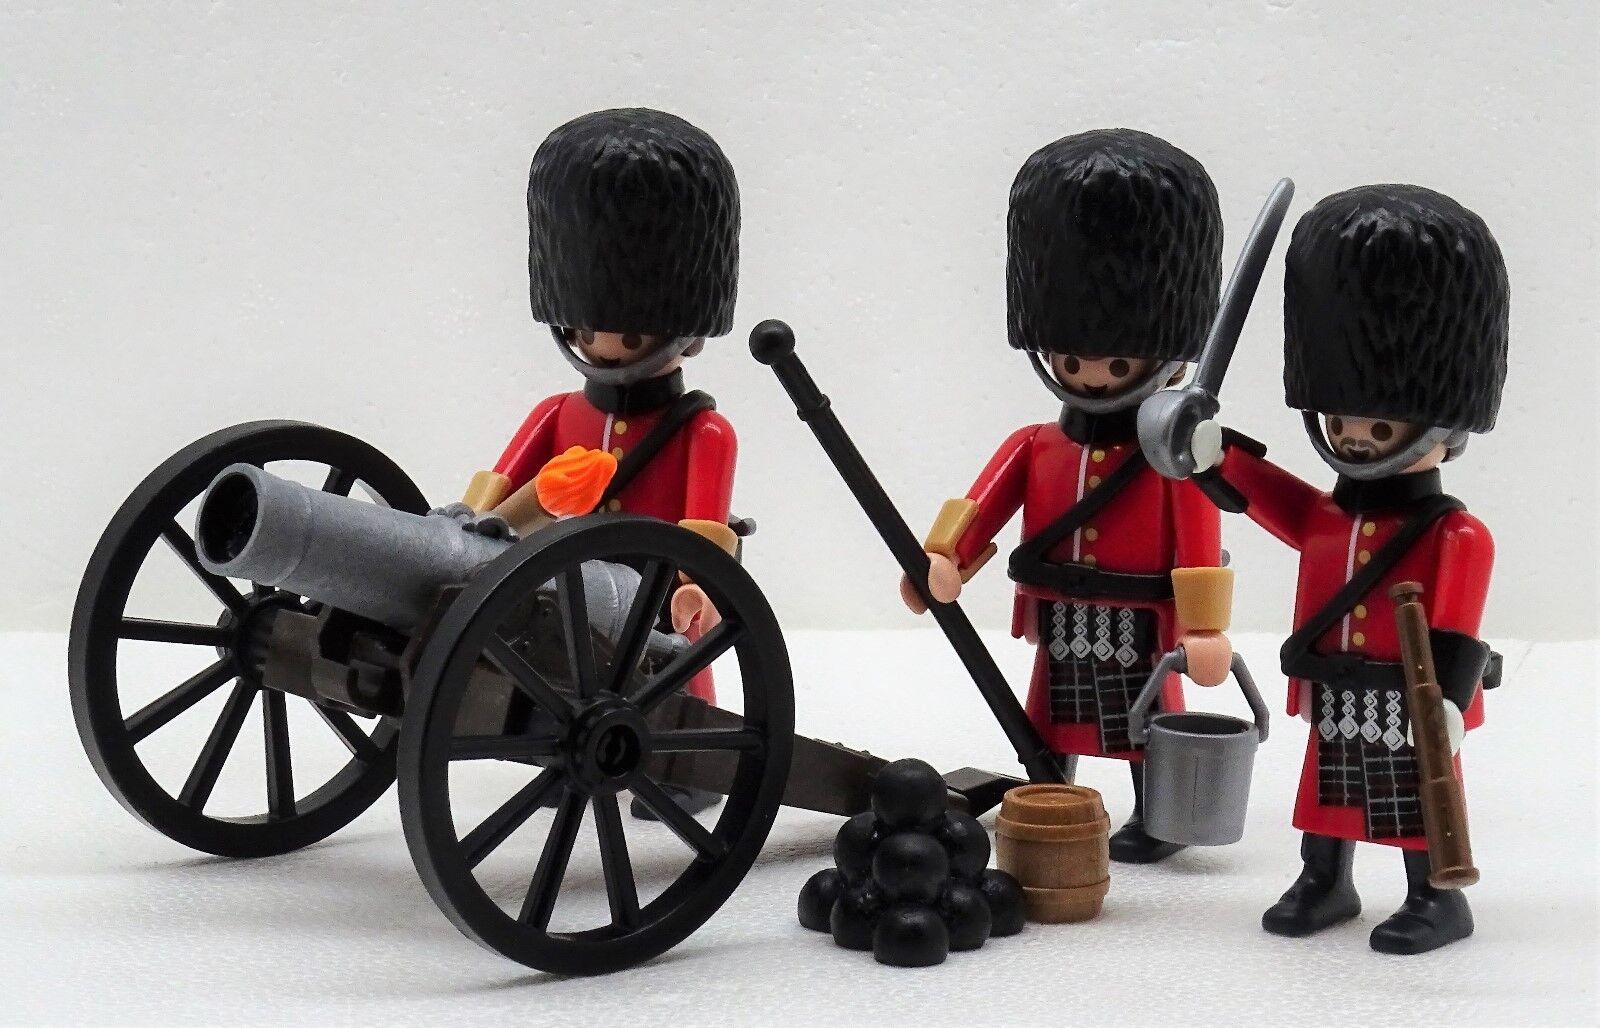 Royal Guard Highlander ARTIGLIERIA Playmobil PER SOLDATO Kanone BEARSKIN CAP